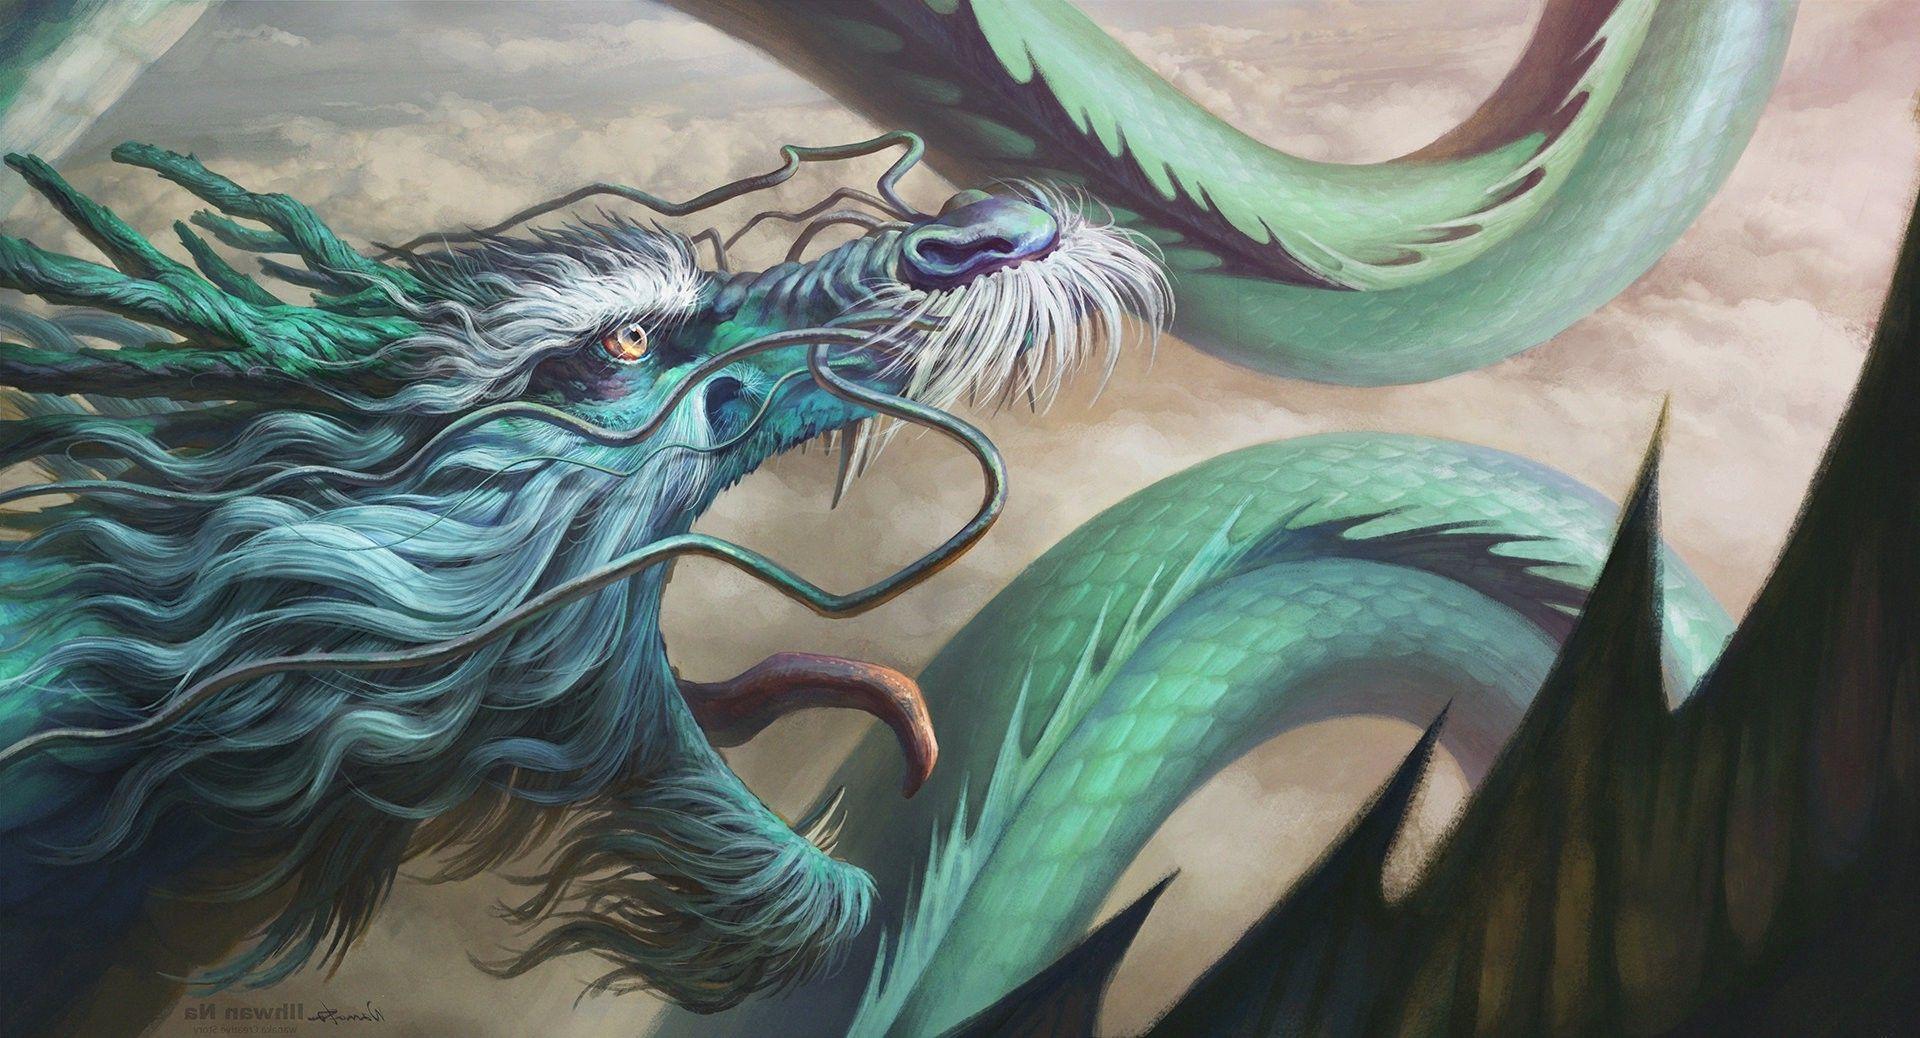 Artwork Fantasy Art Dragon Chinese Dragon Wallpaper Chinese Dragon Art Fantasy Chinese Dragon